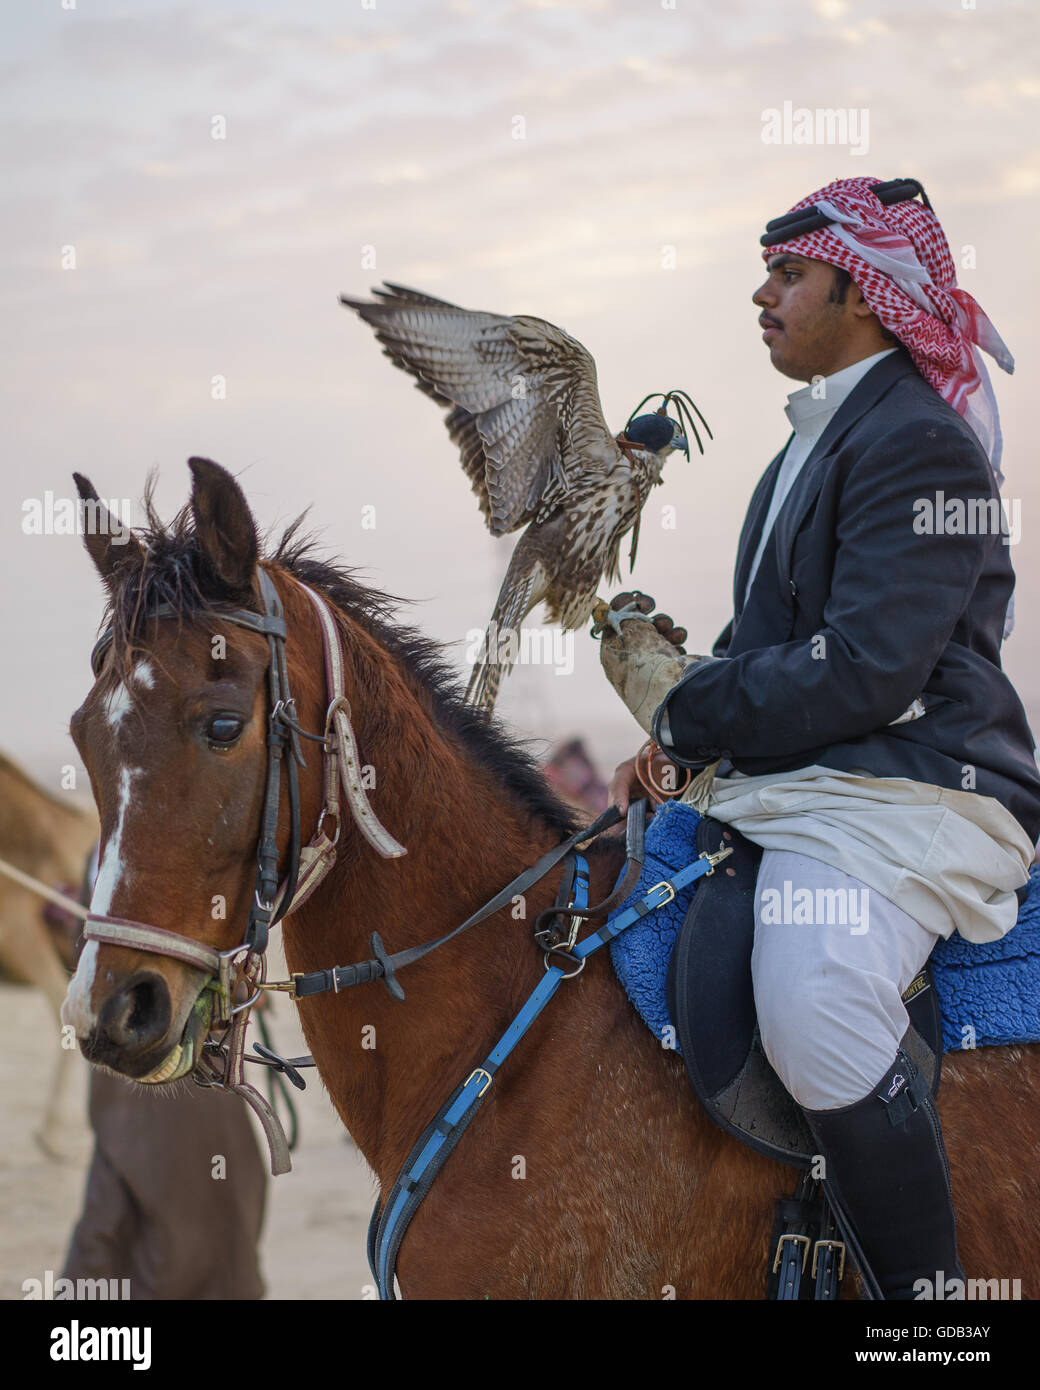 Hunter on horseback with his falcon, Qatar. - Stock Image